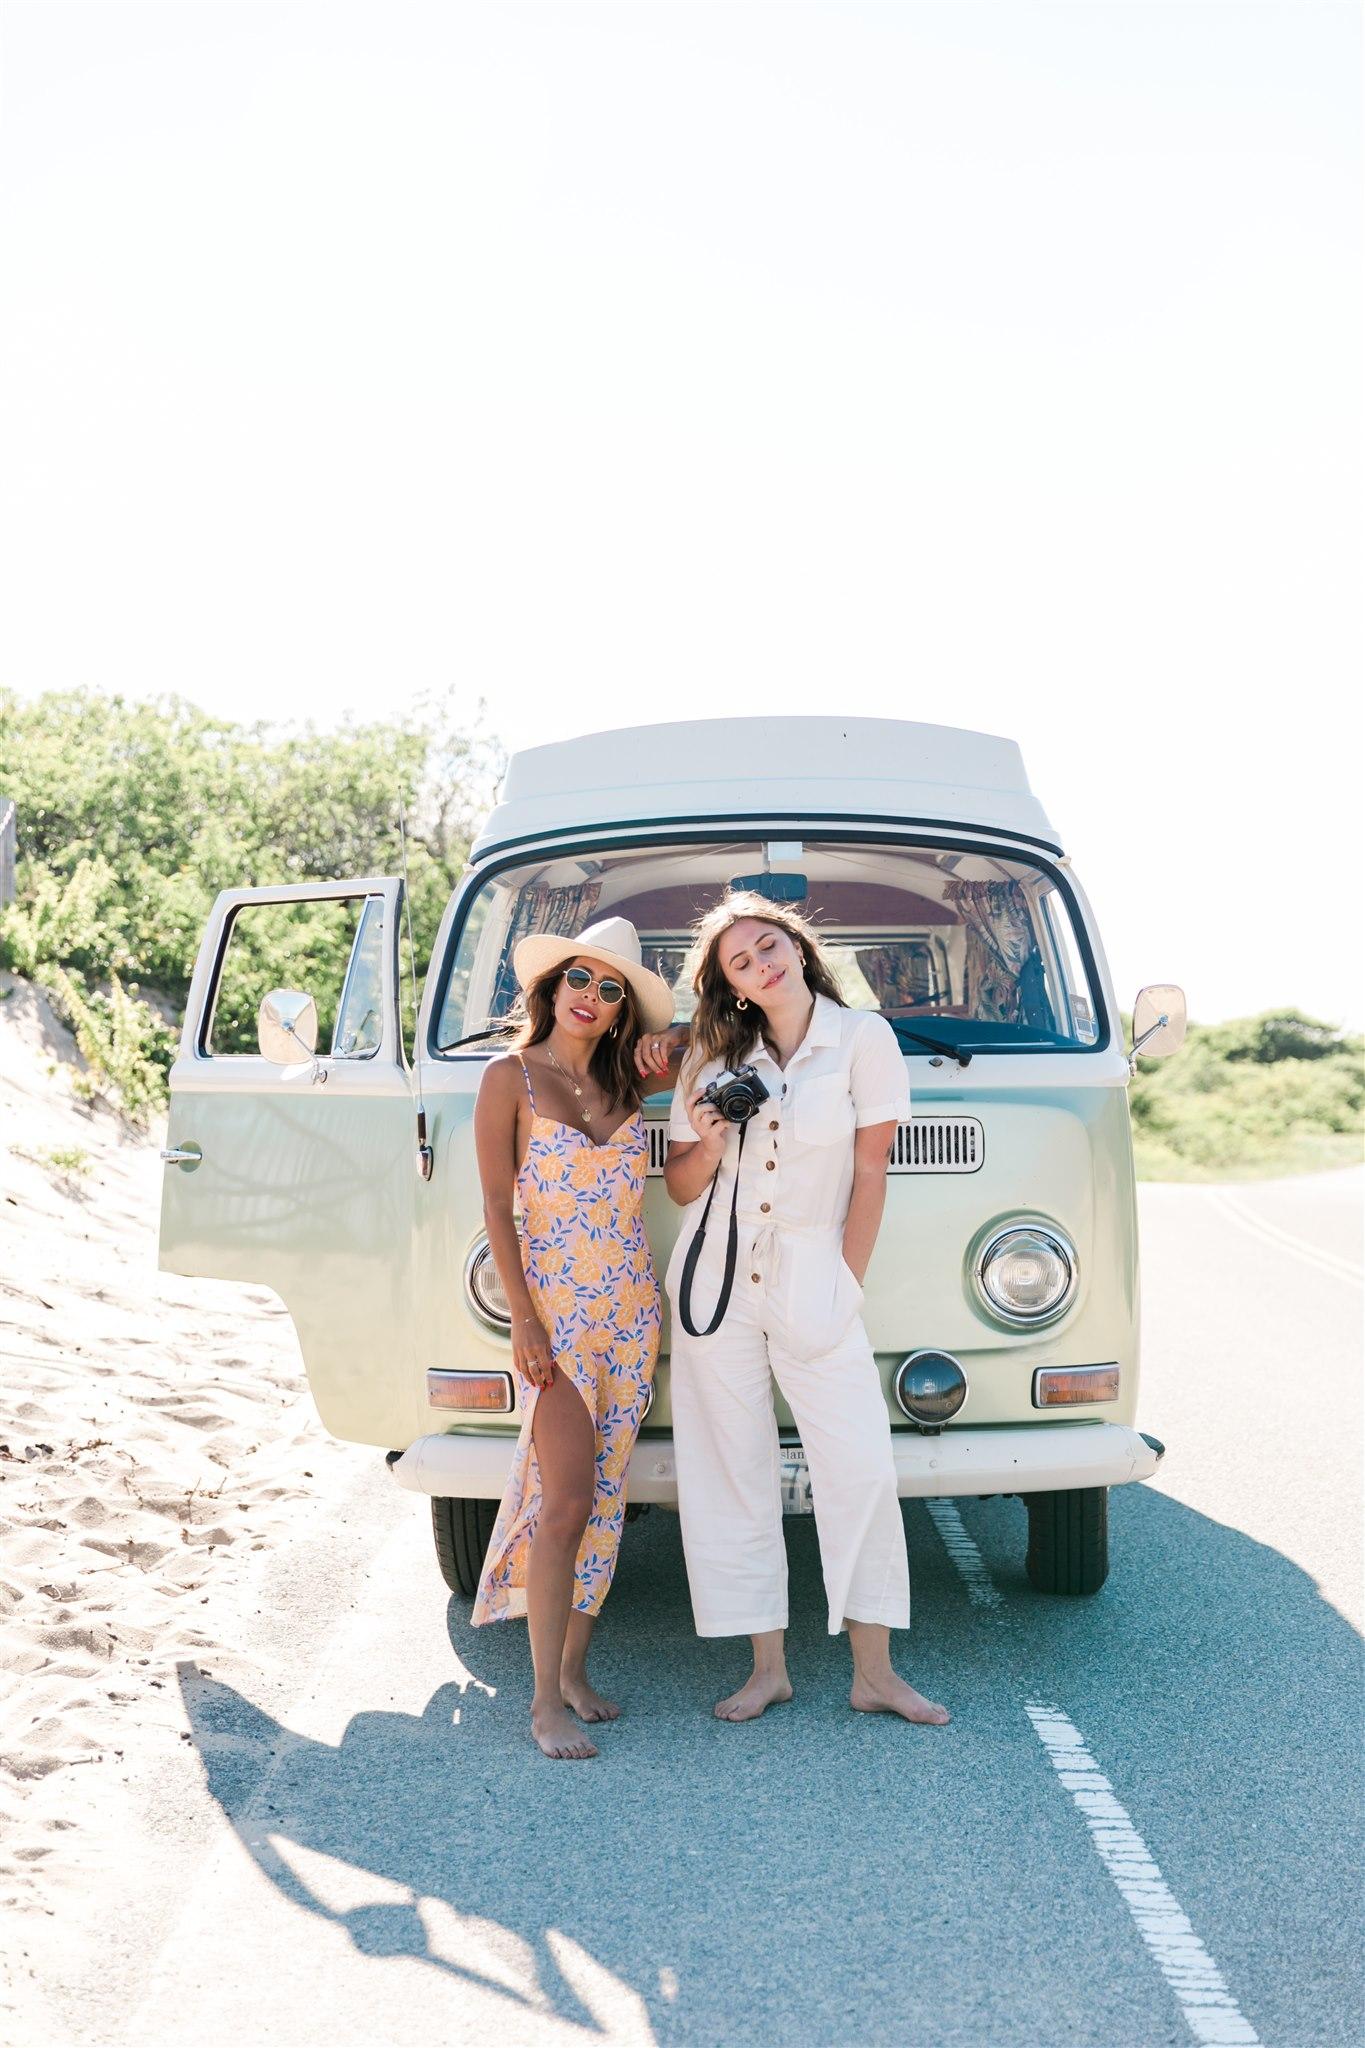 Ptown, Cape Cod with IFAW + Kin Travel with Wish Wish Wish